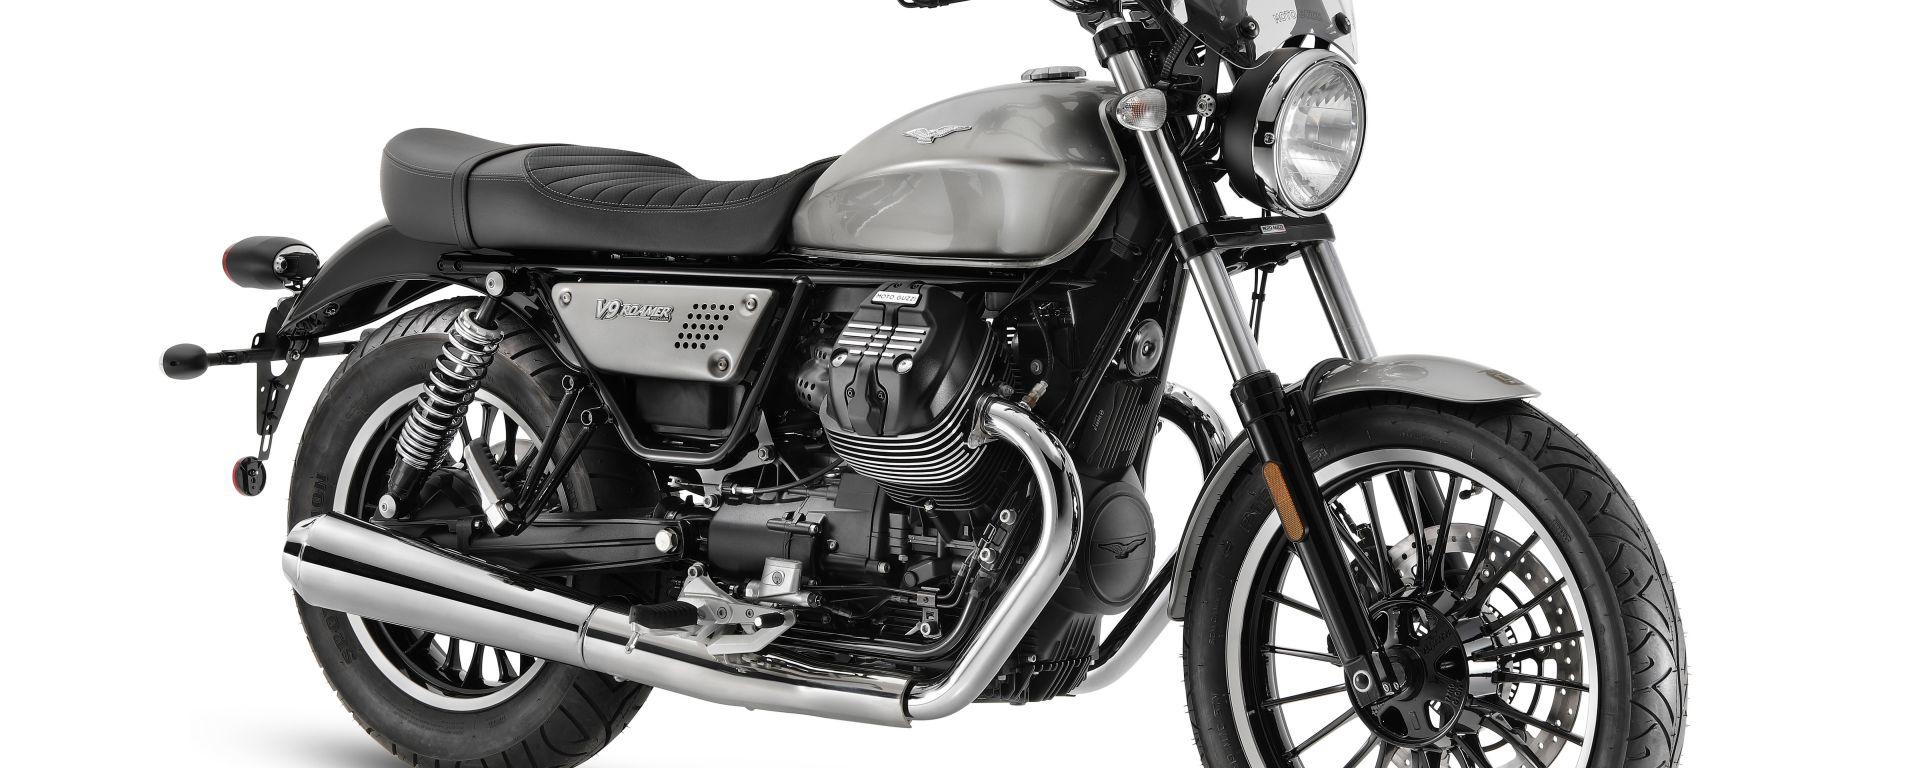 Moto Guzzi V9 2021: ecco quanto costano Bobber e Roamer